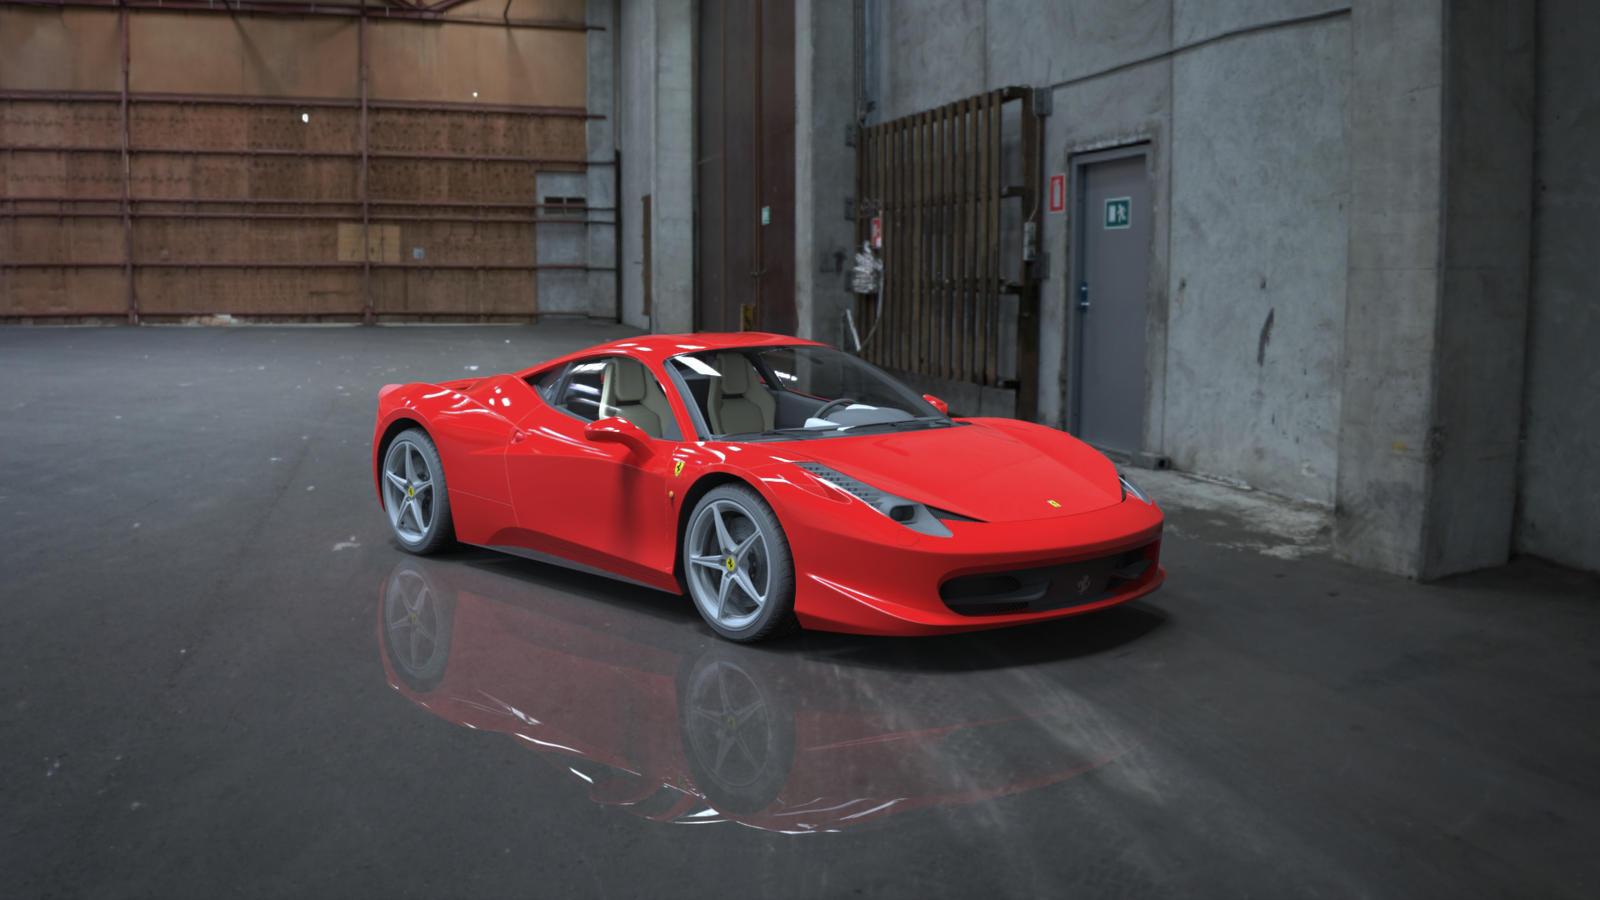 Ferrari 458 italia garage by binary map on deviantart for Garage ferrari charnecles